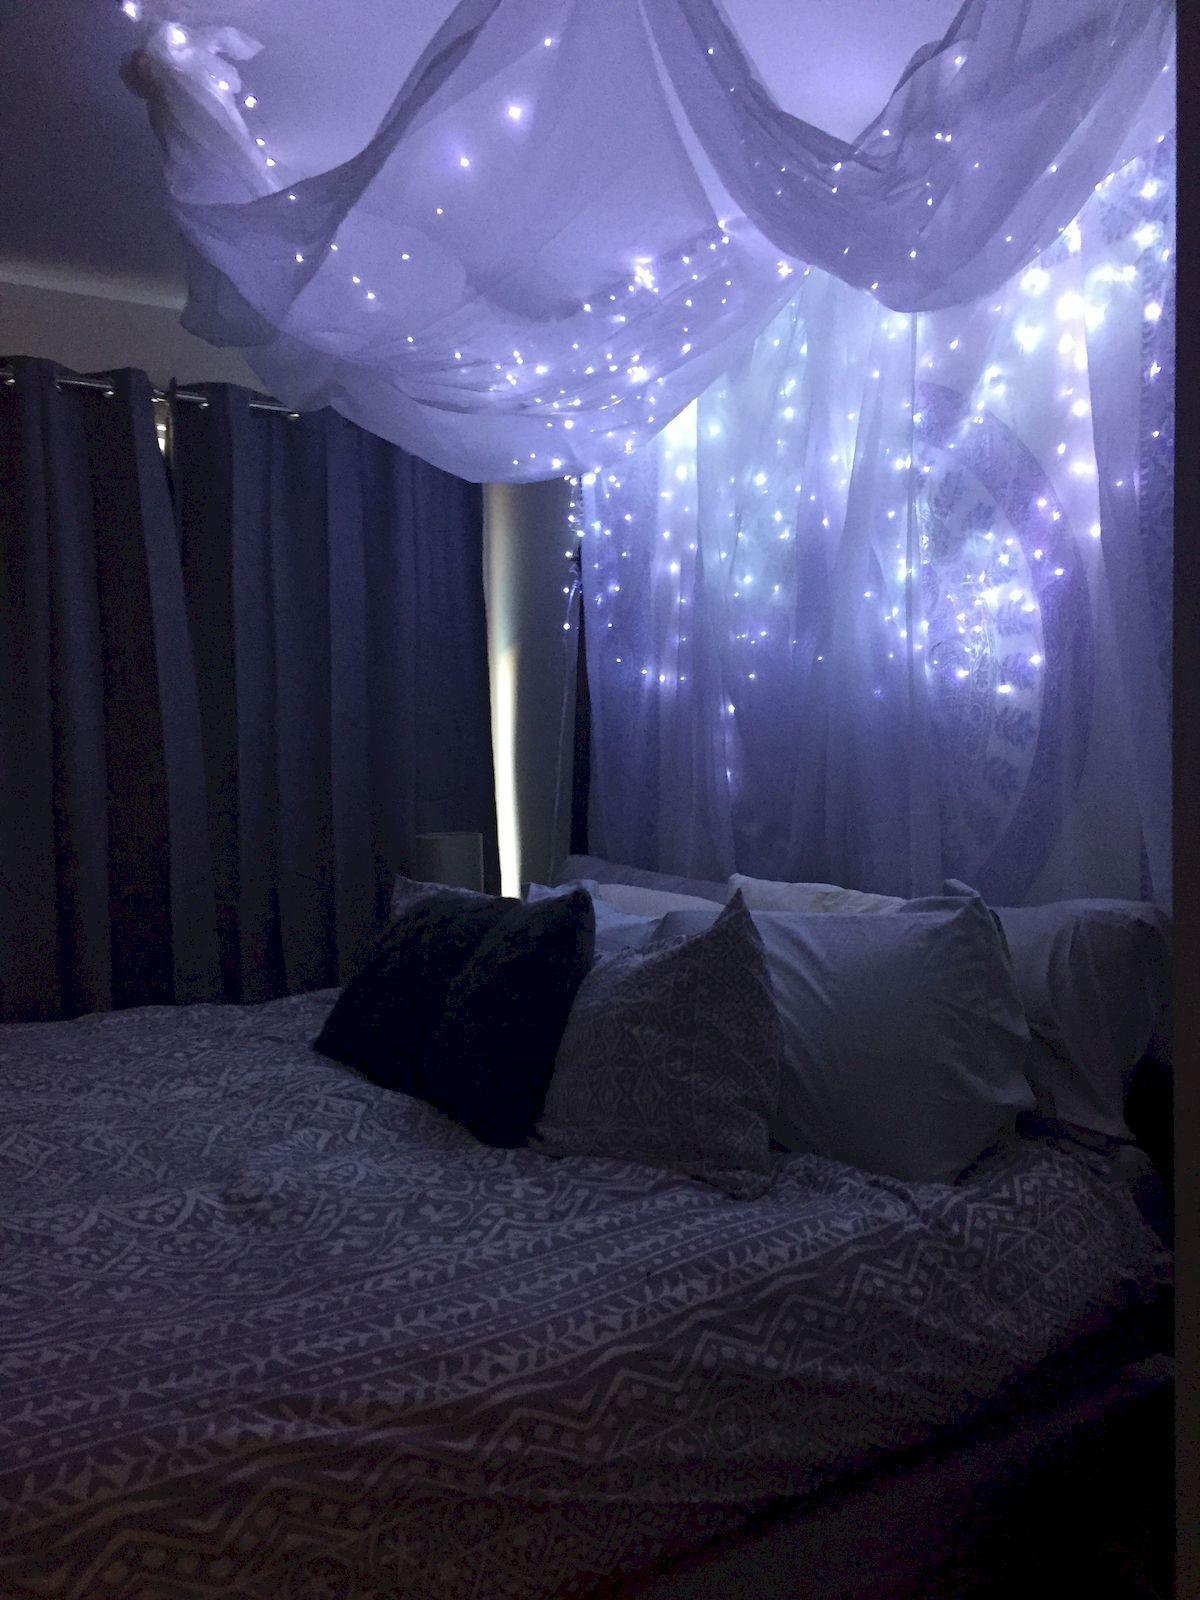 Stunning Bedroom Lighting Ideas images